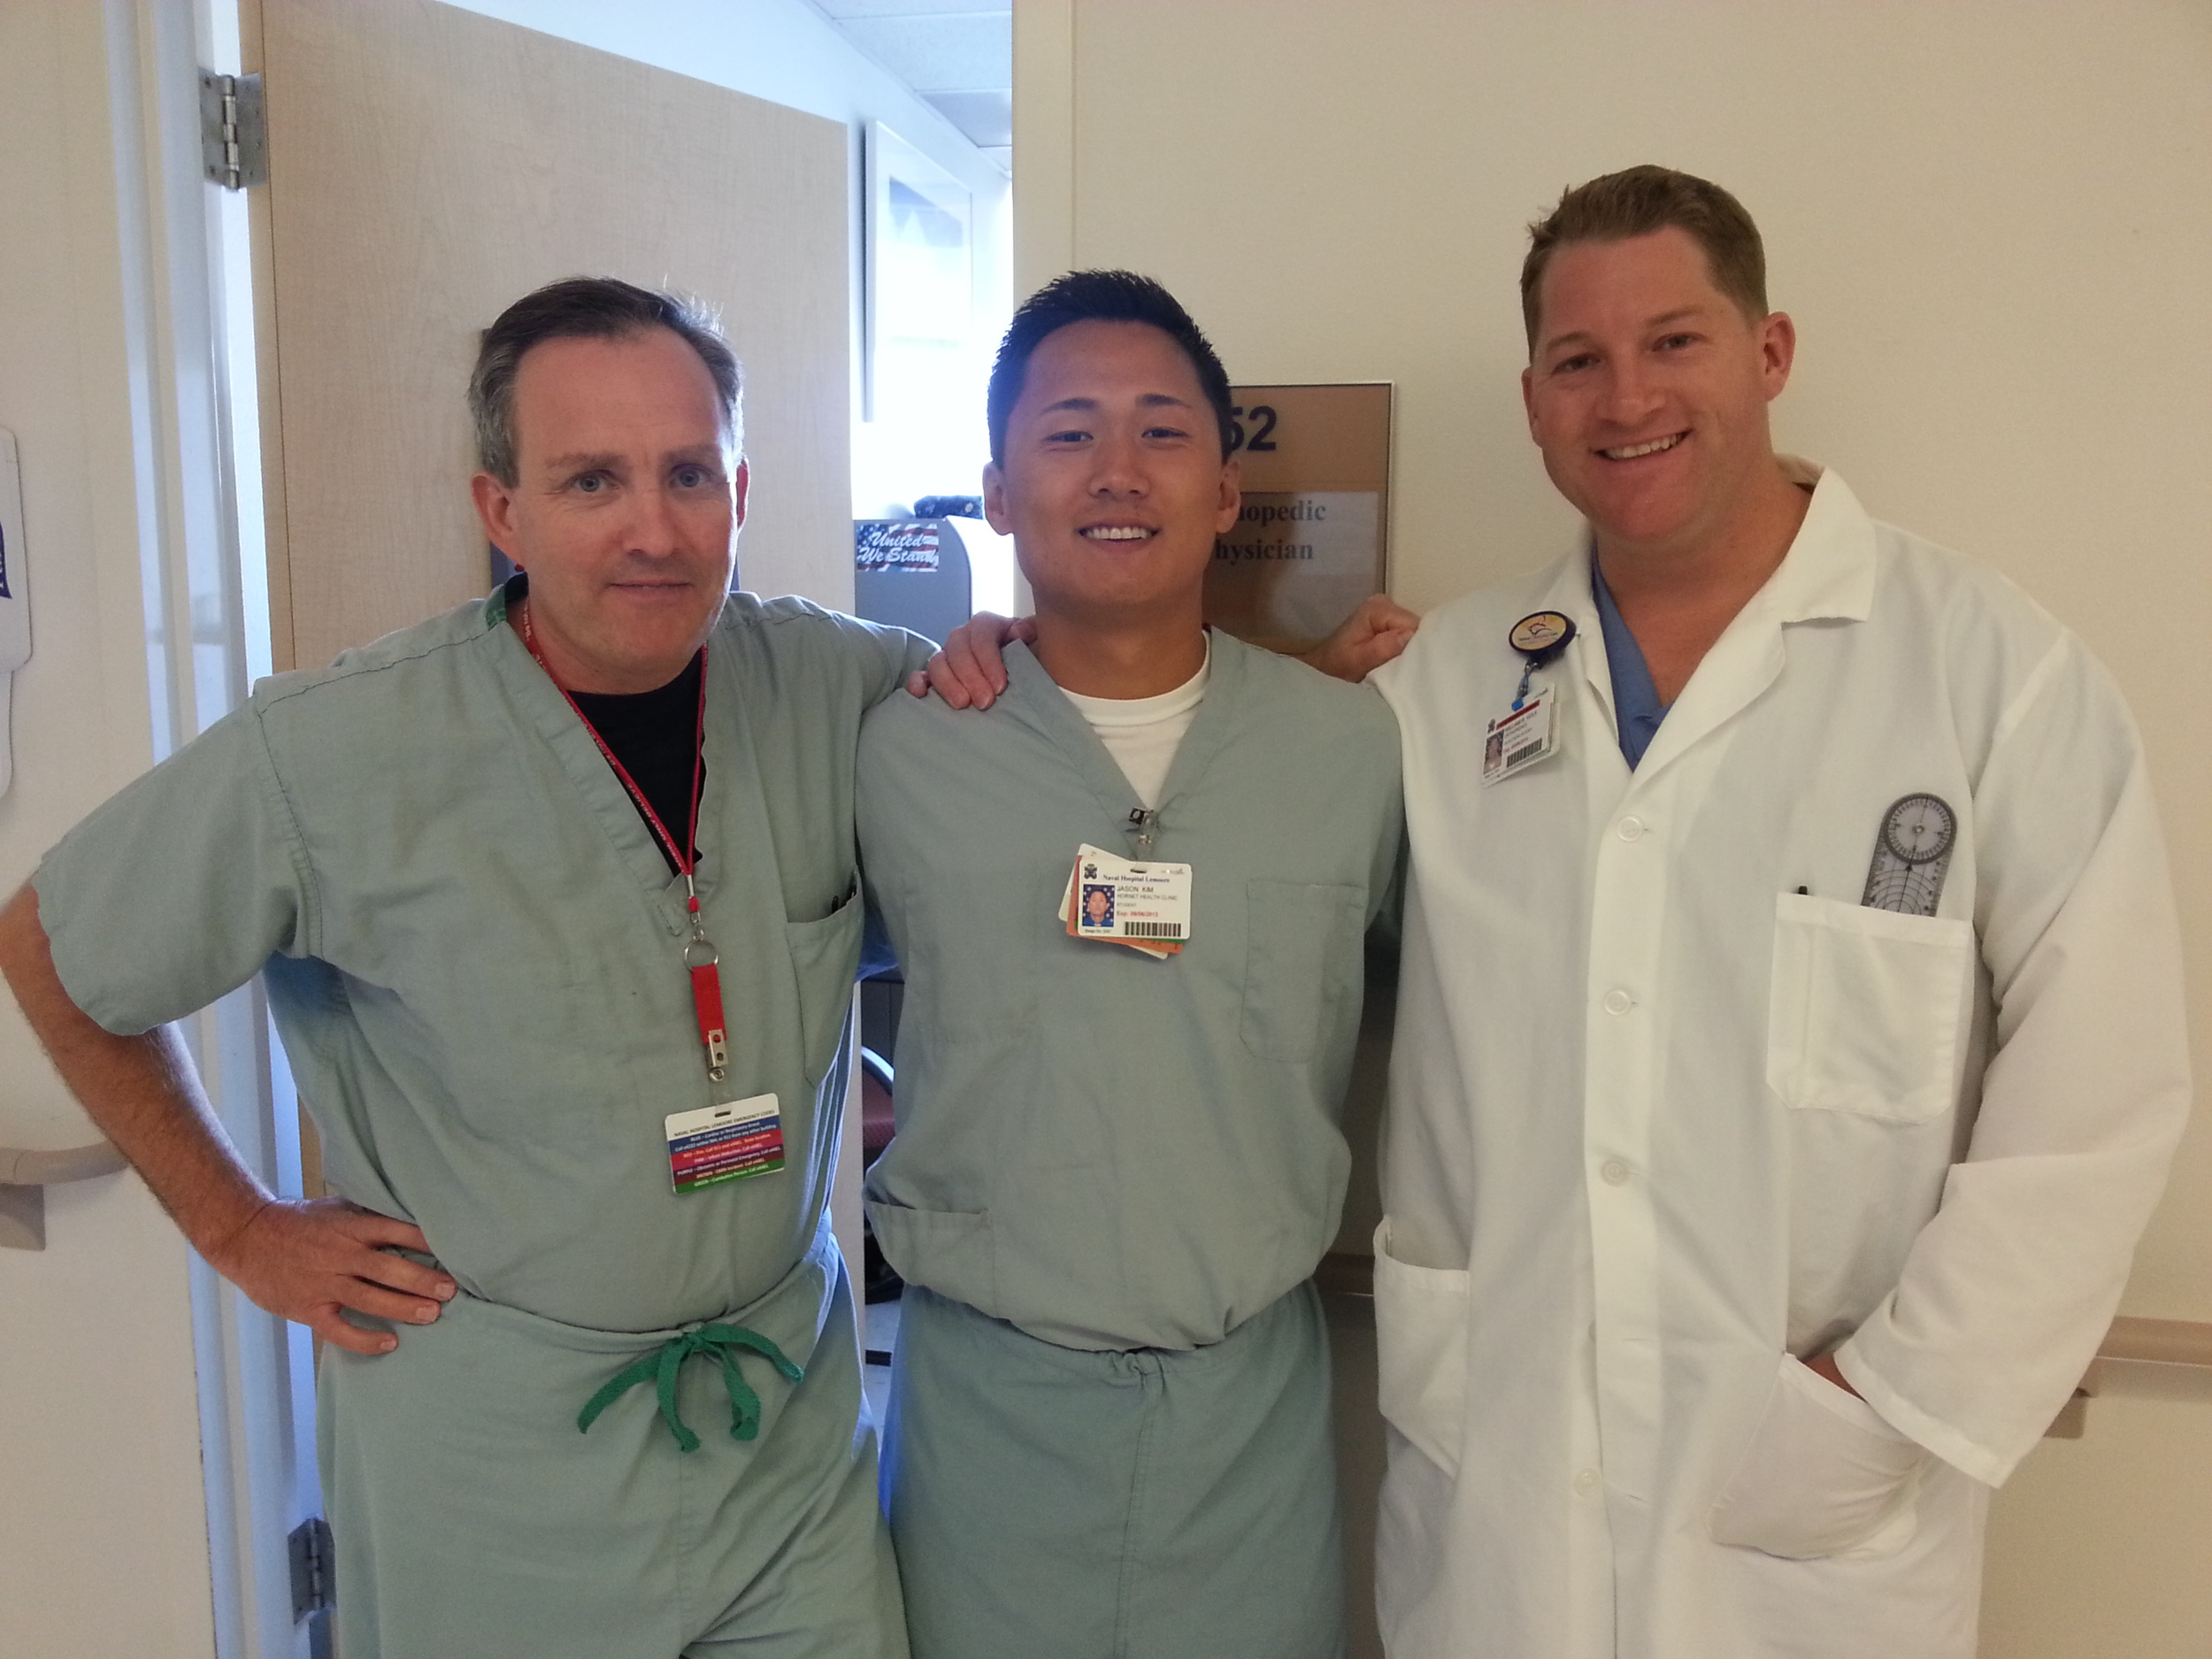 Surgery Center, Naval Hospital,Lemoore, CA